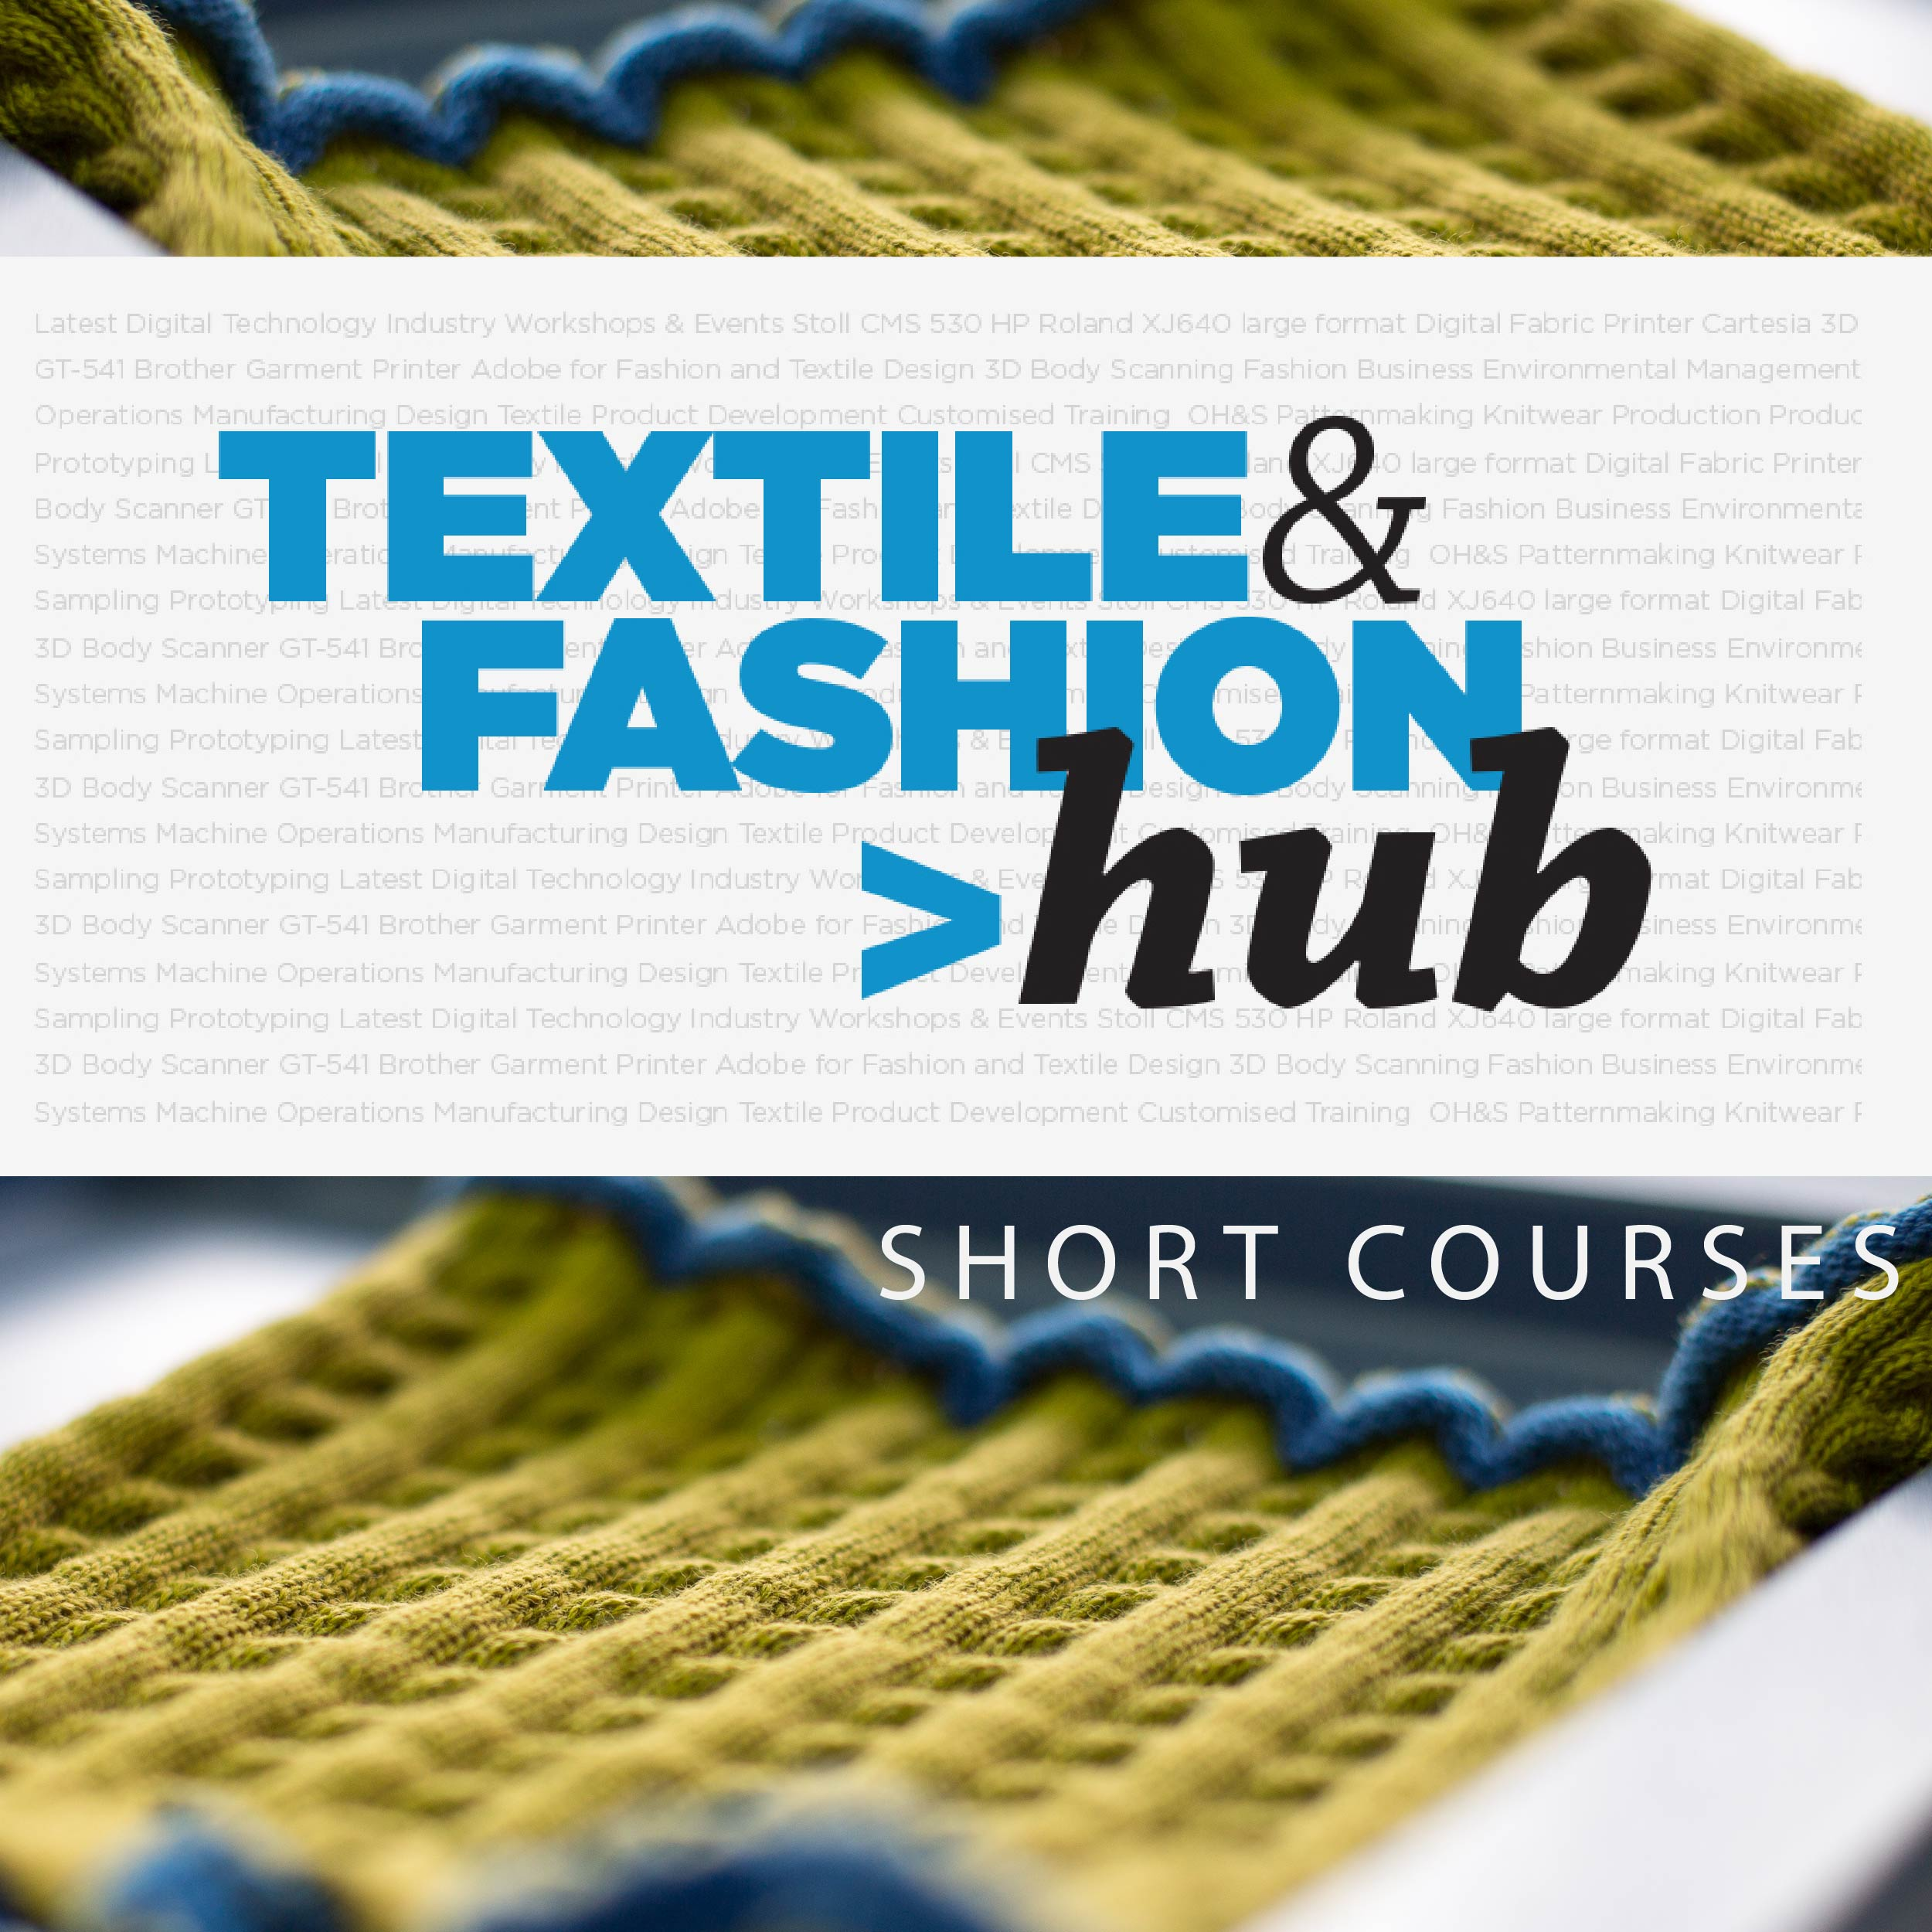 textile-fashion-hub-short-courses-2016-01-01.jpg